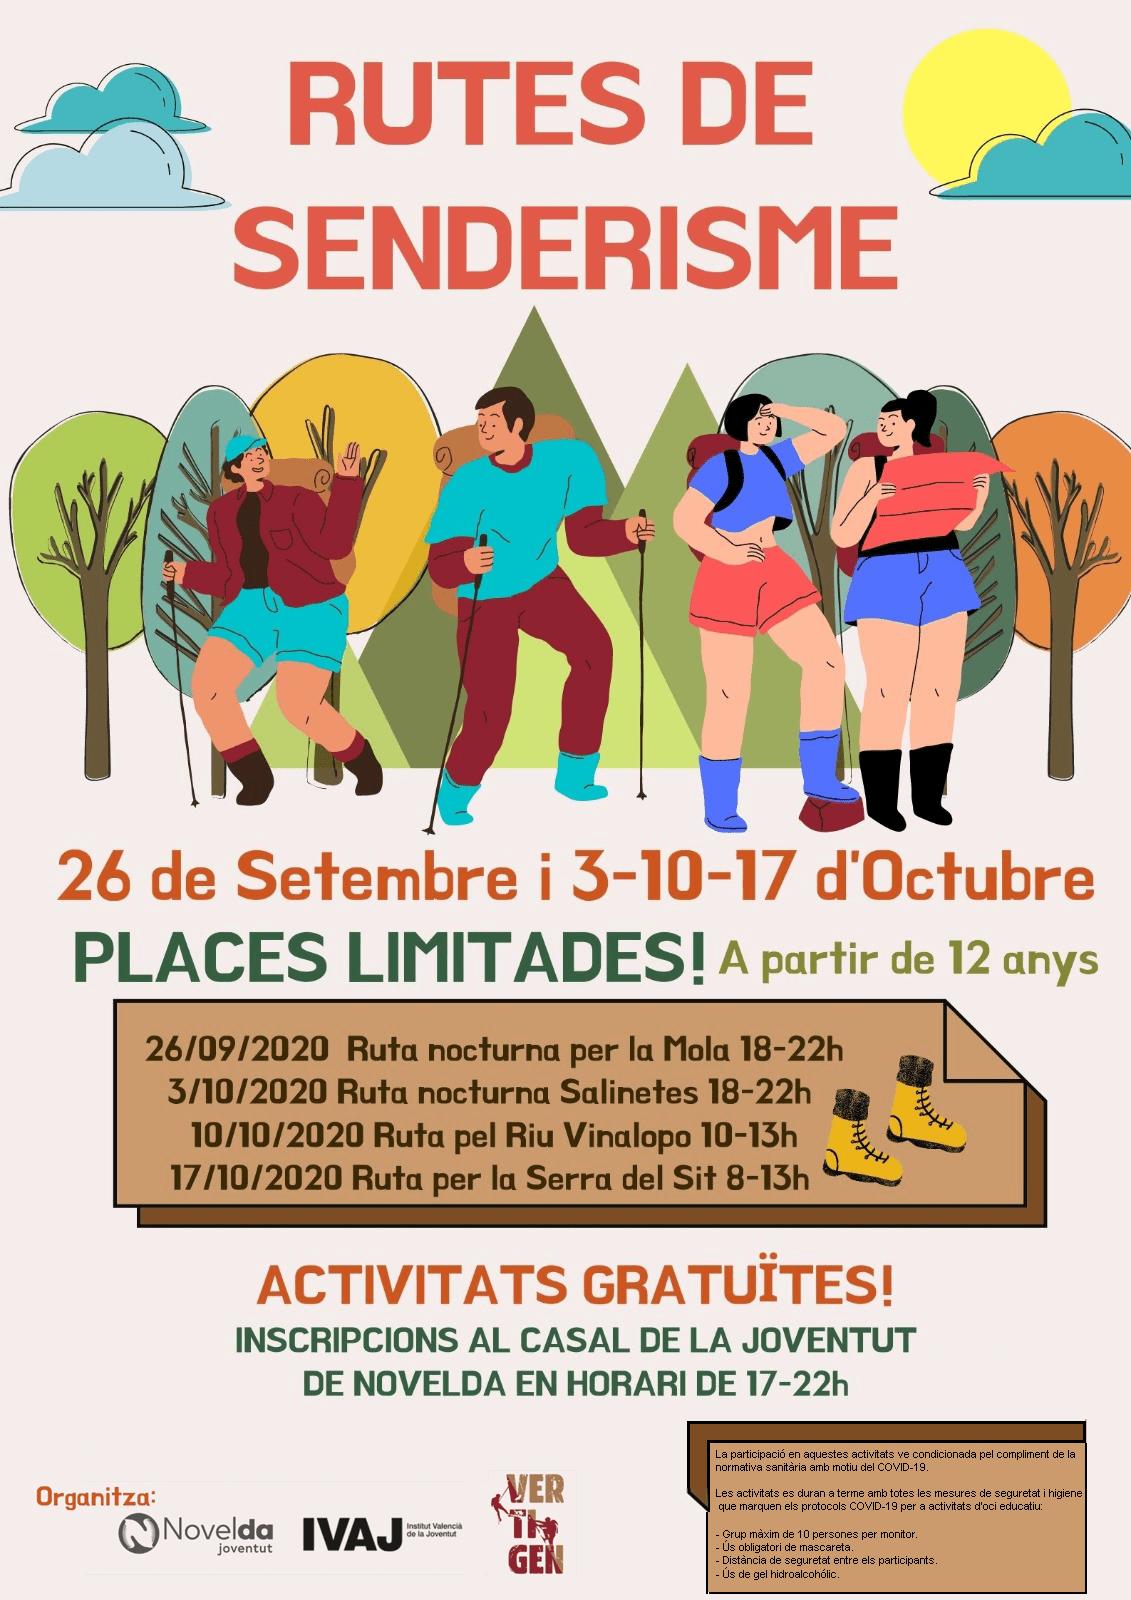 Ayuntamiento de Novelda rutes-senderistes1 Ruta senderista per la Serra del Cid